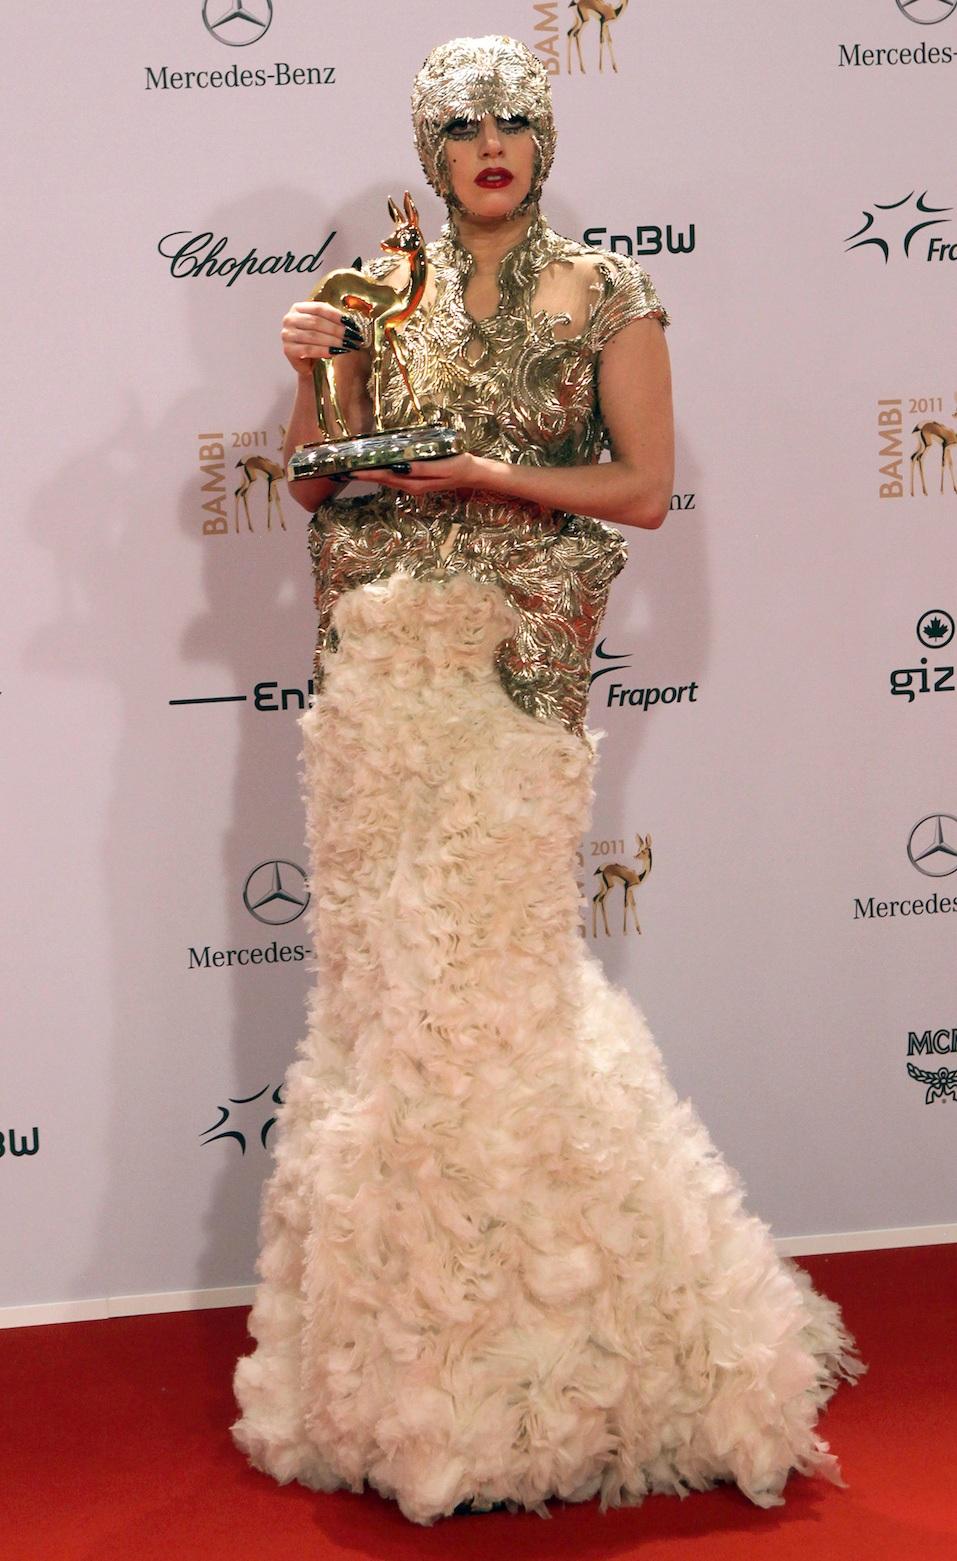 US singer Lady Gaga poses with her International Pop award